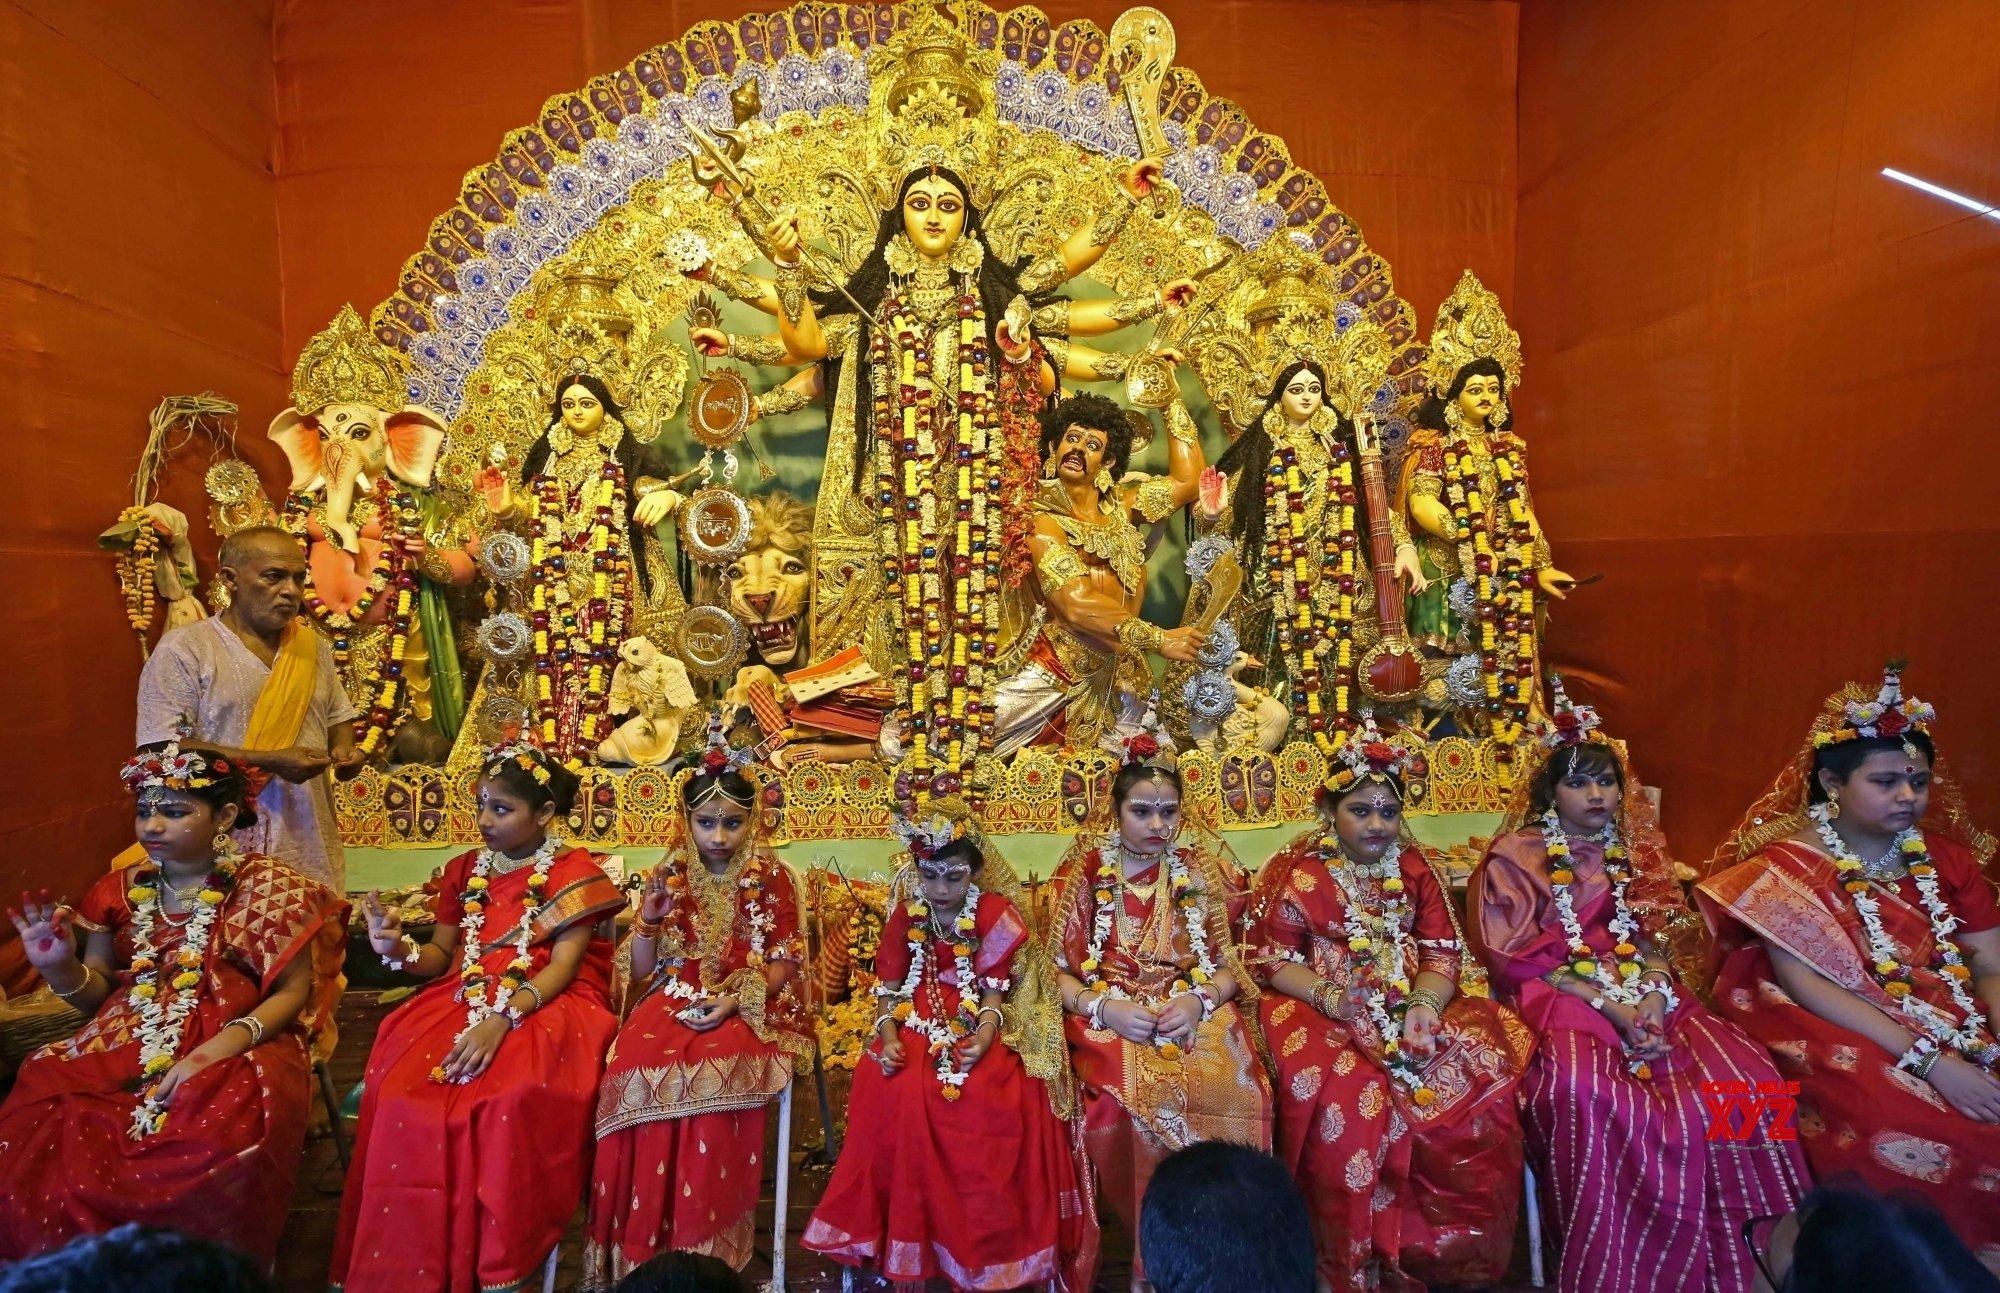 Kolkata : Hindu priests guide a young unmarried girls known as 'Kumari', who dress up as the Hindu goddess Durga on Maha Ashtami Puja, during a ritual for the Durga Puja festival at a community puja pandal in Kolkata #Gallery